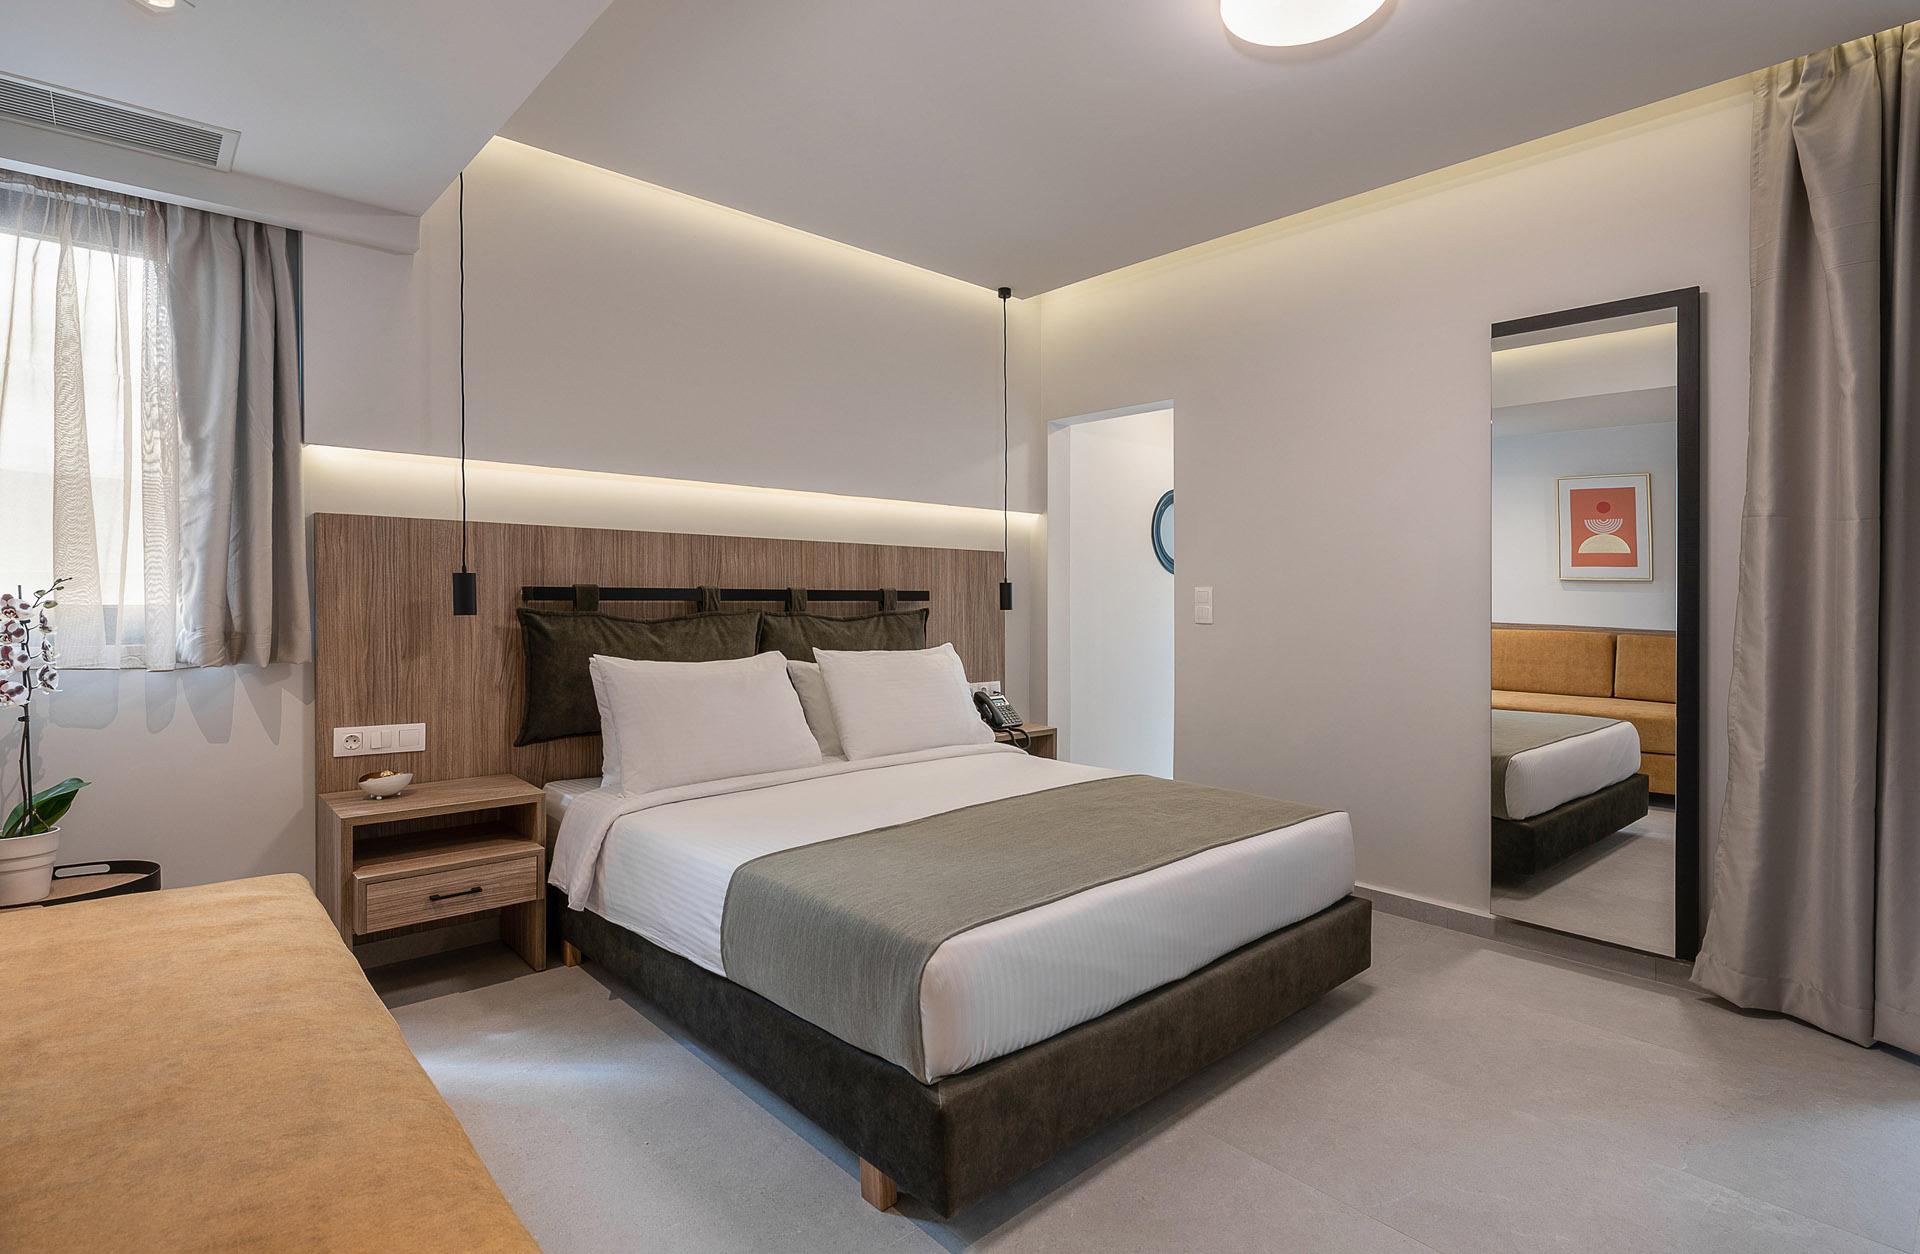 Morum Chania City Hotel